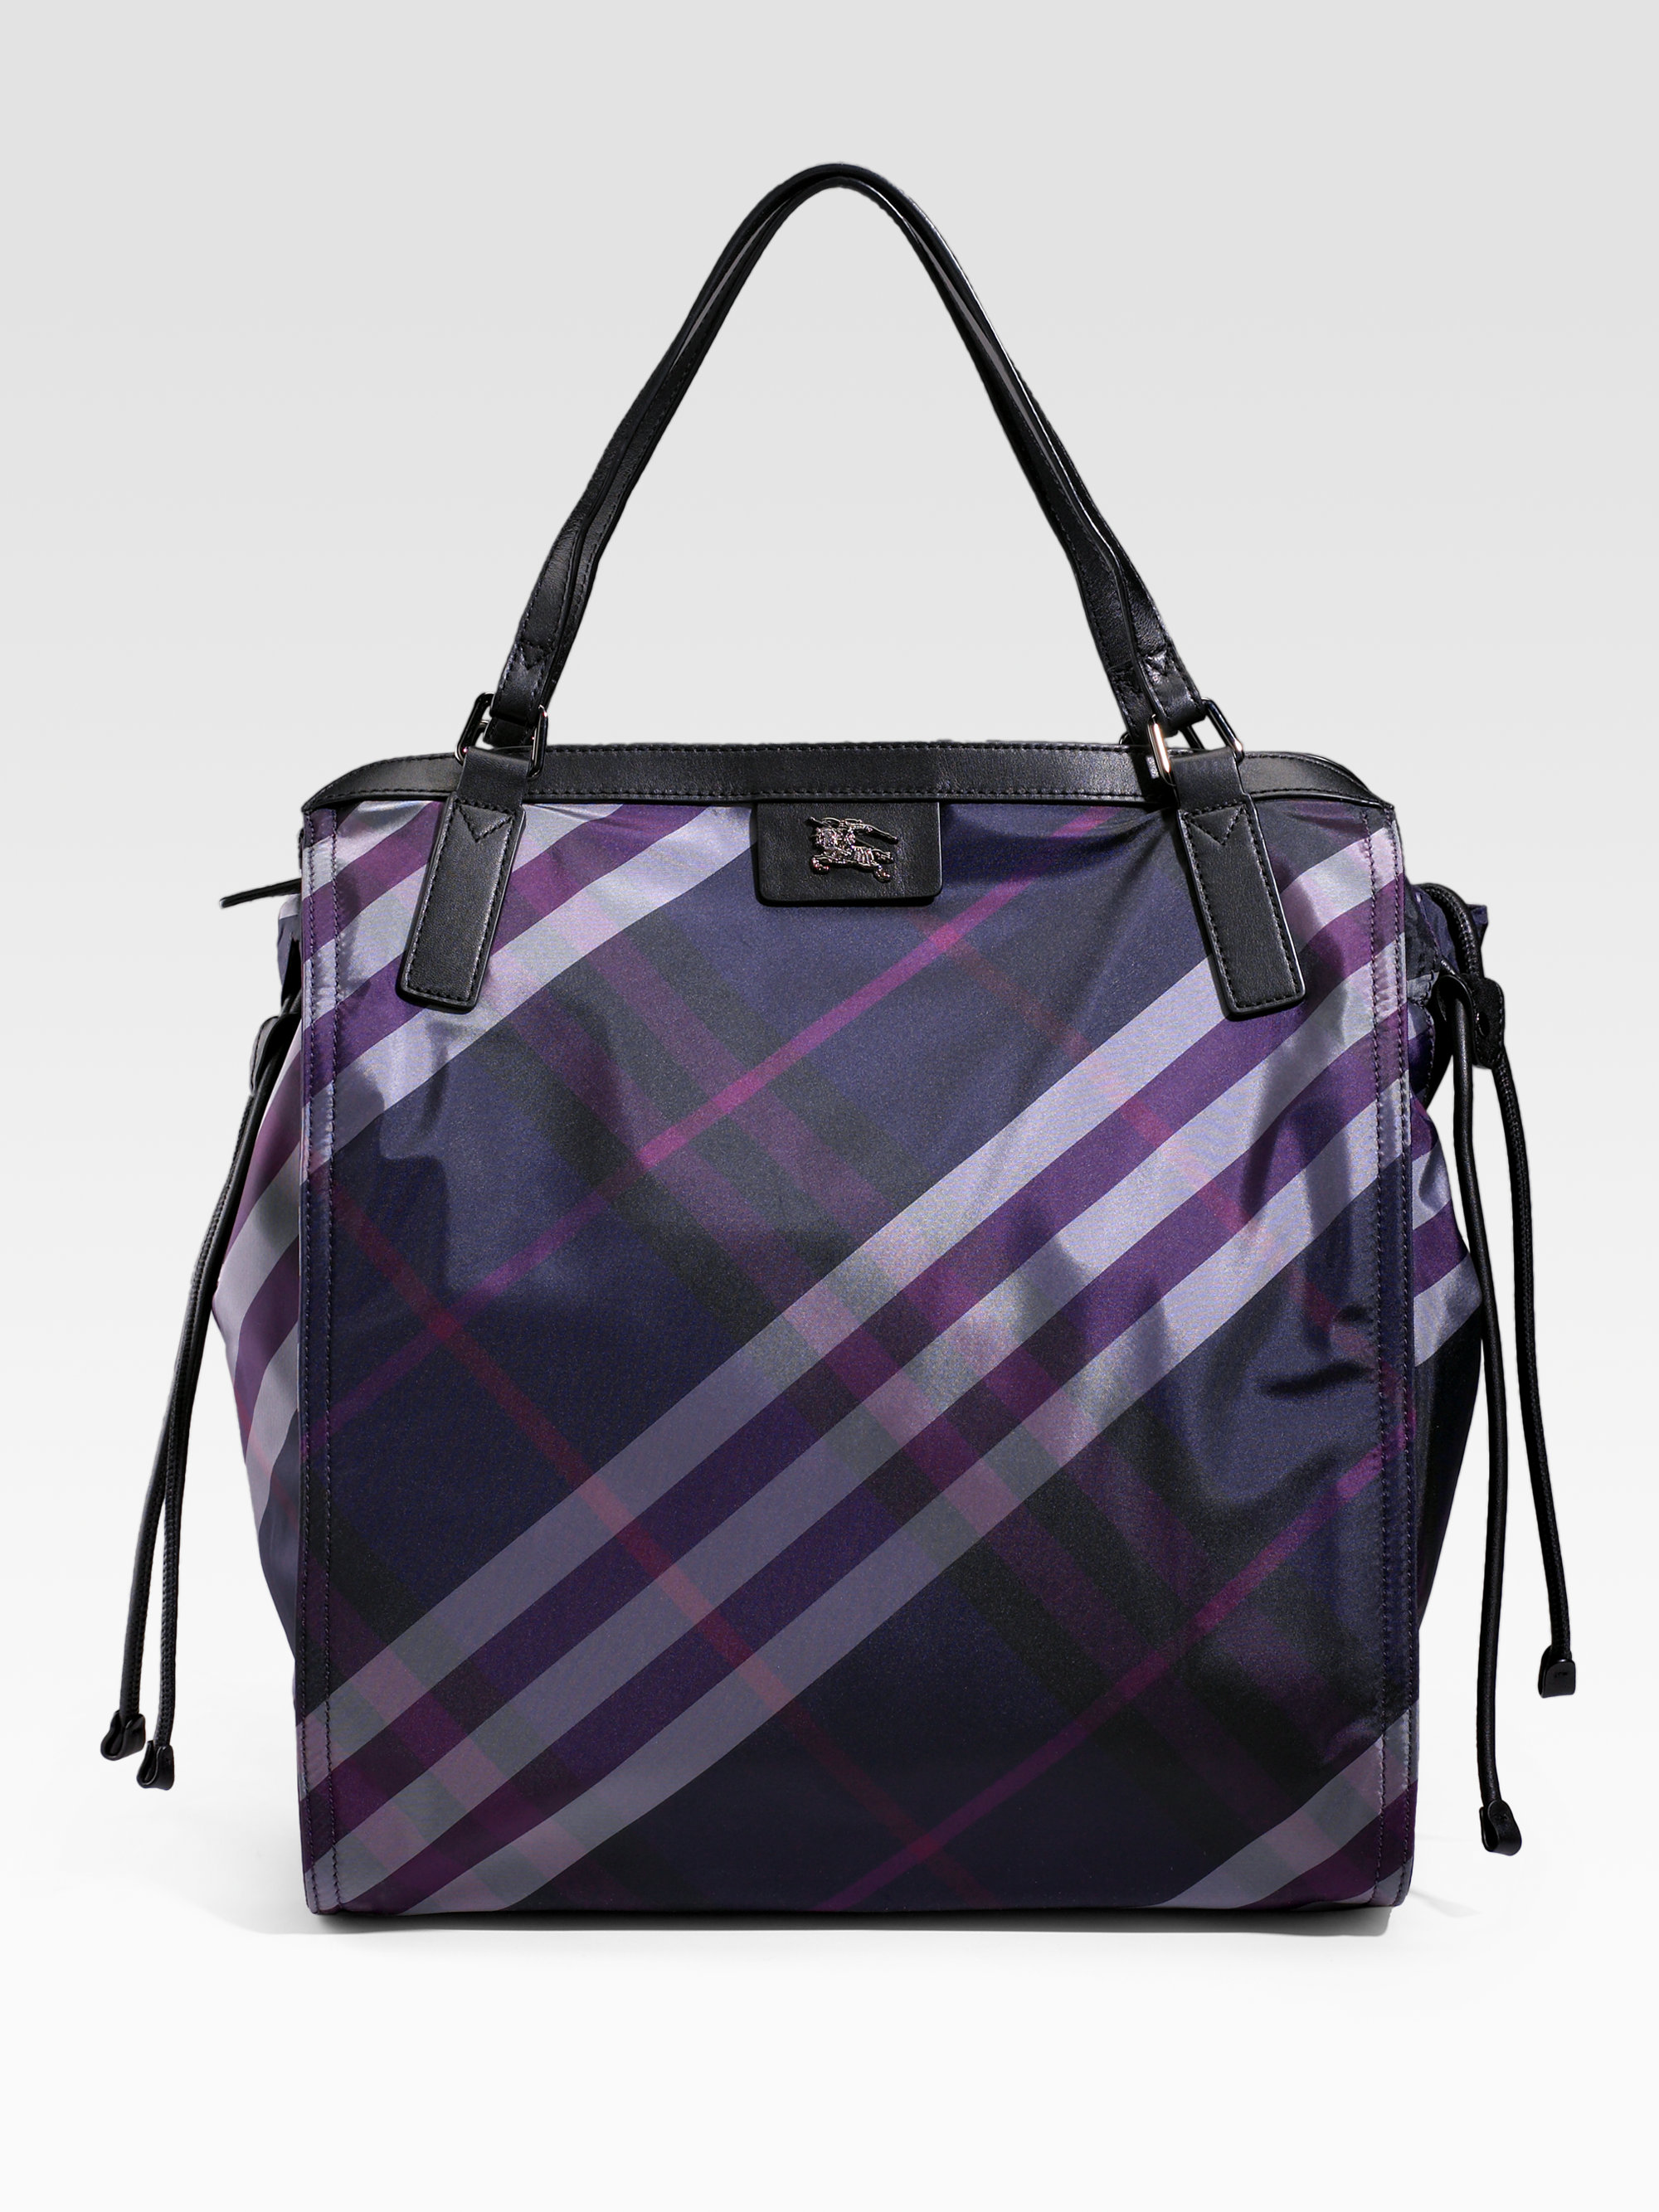 Burberry Bags Purple